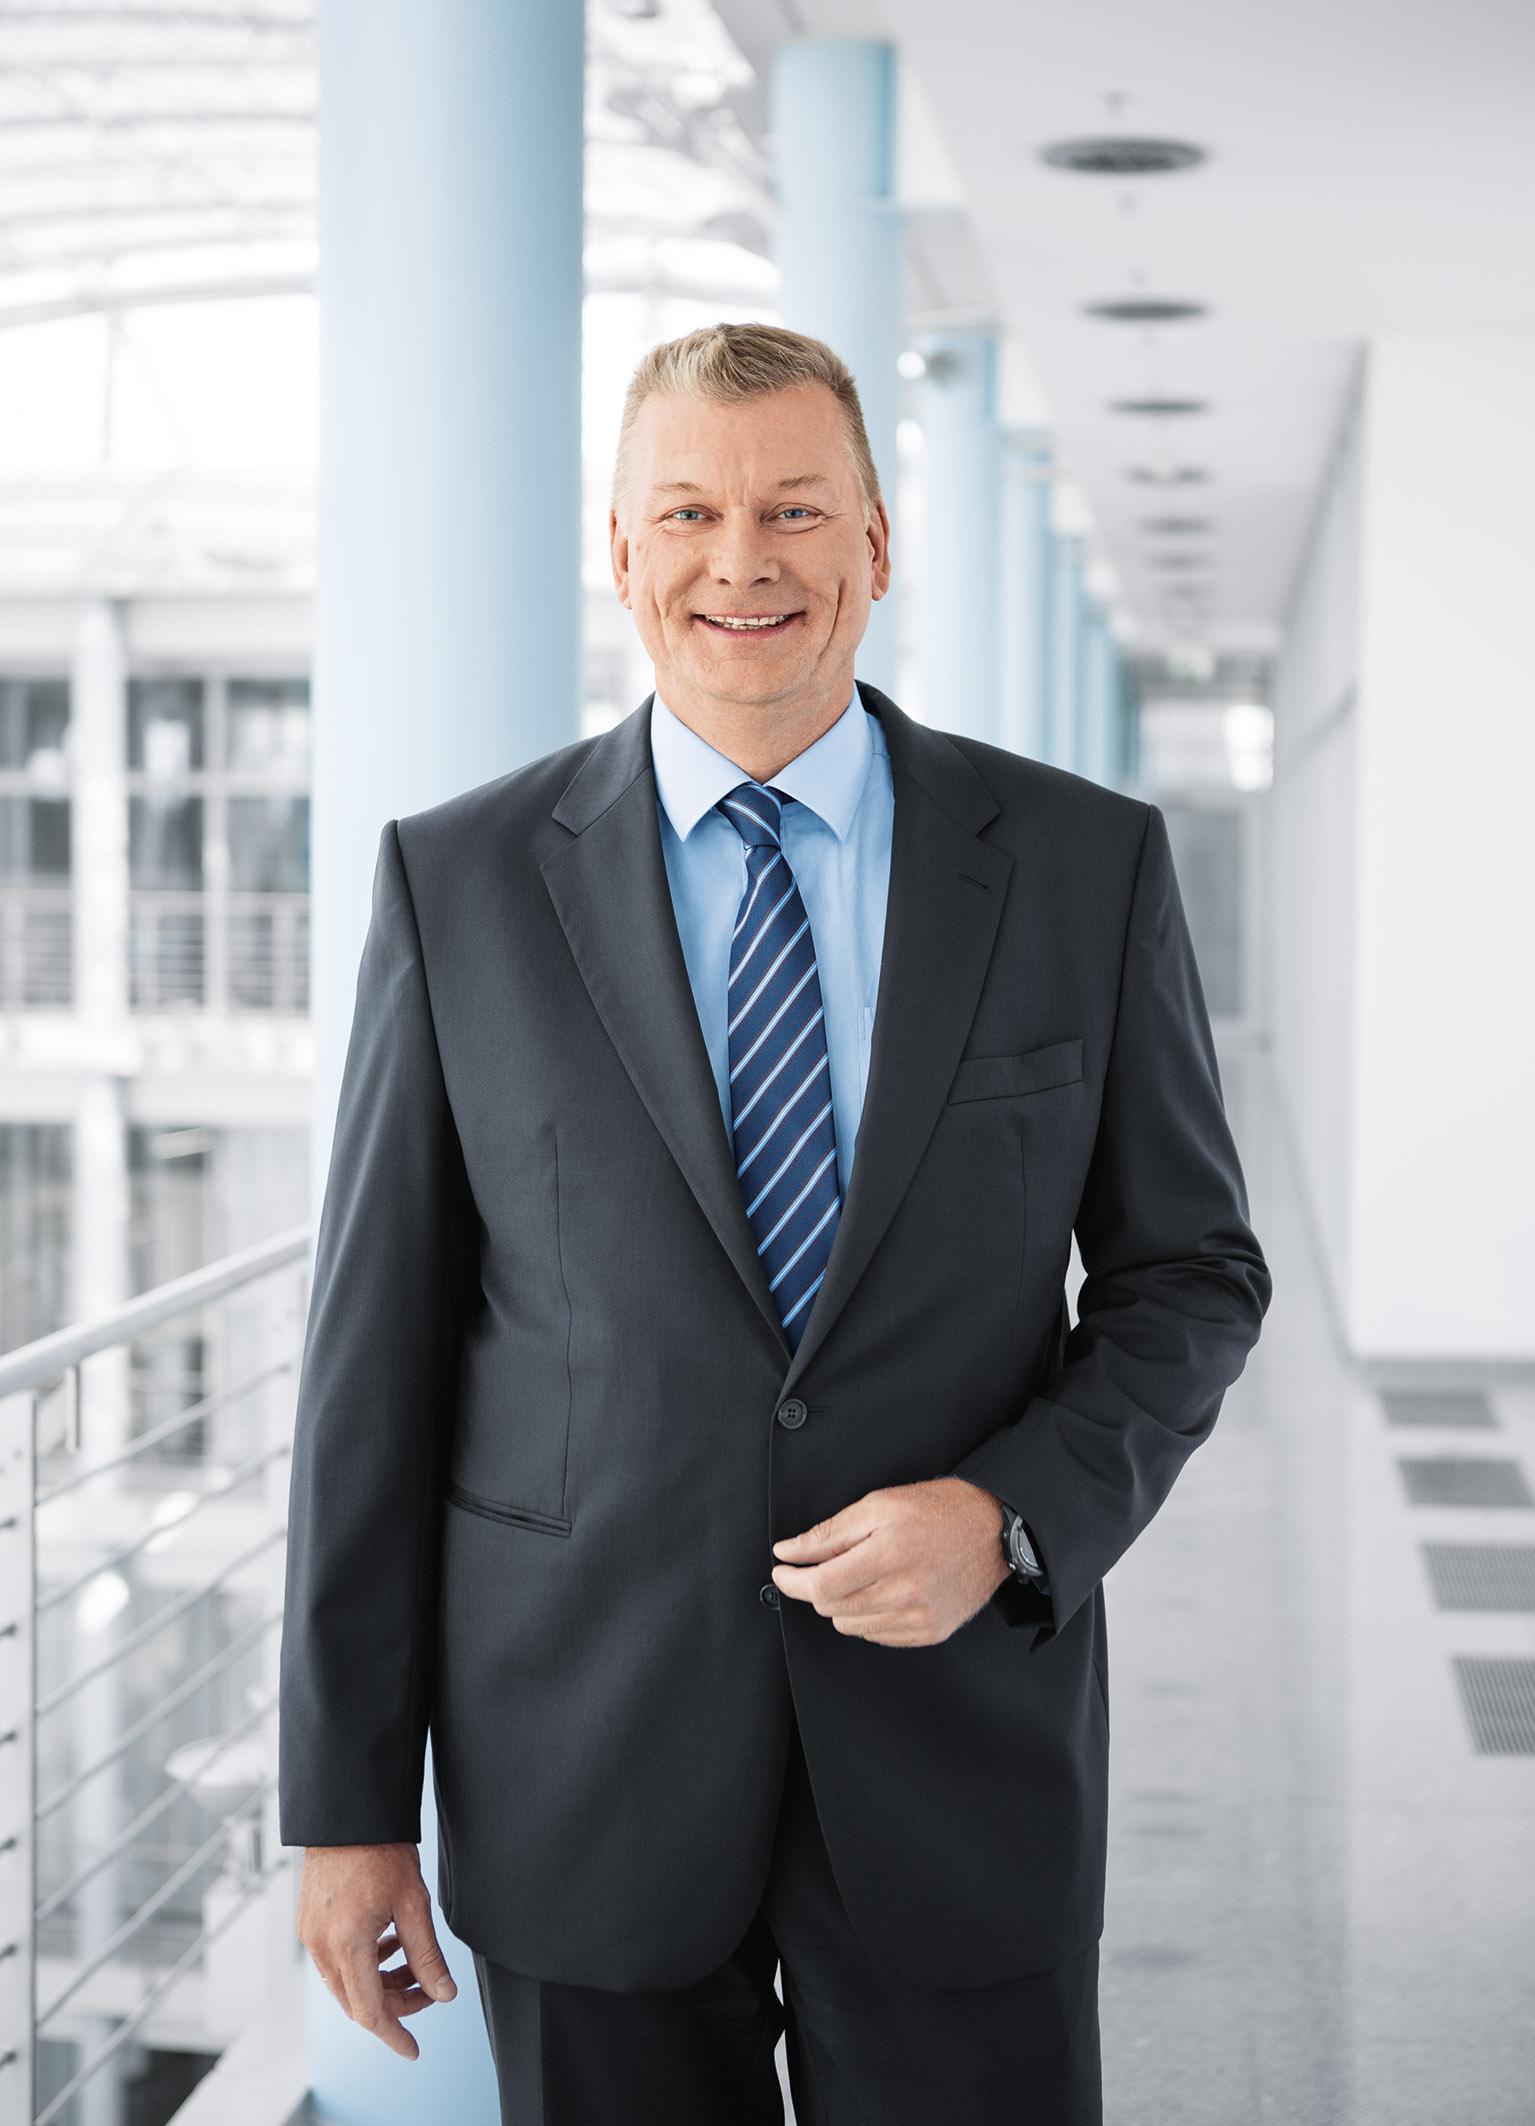 Член совета директоров Festo AG & CO KG, доктор Ансгар Кривет (Ansgar Kriwet)